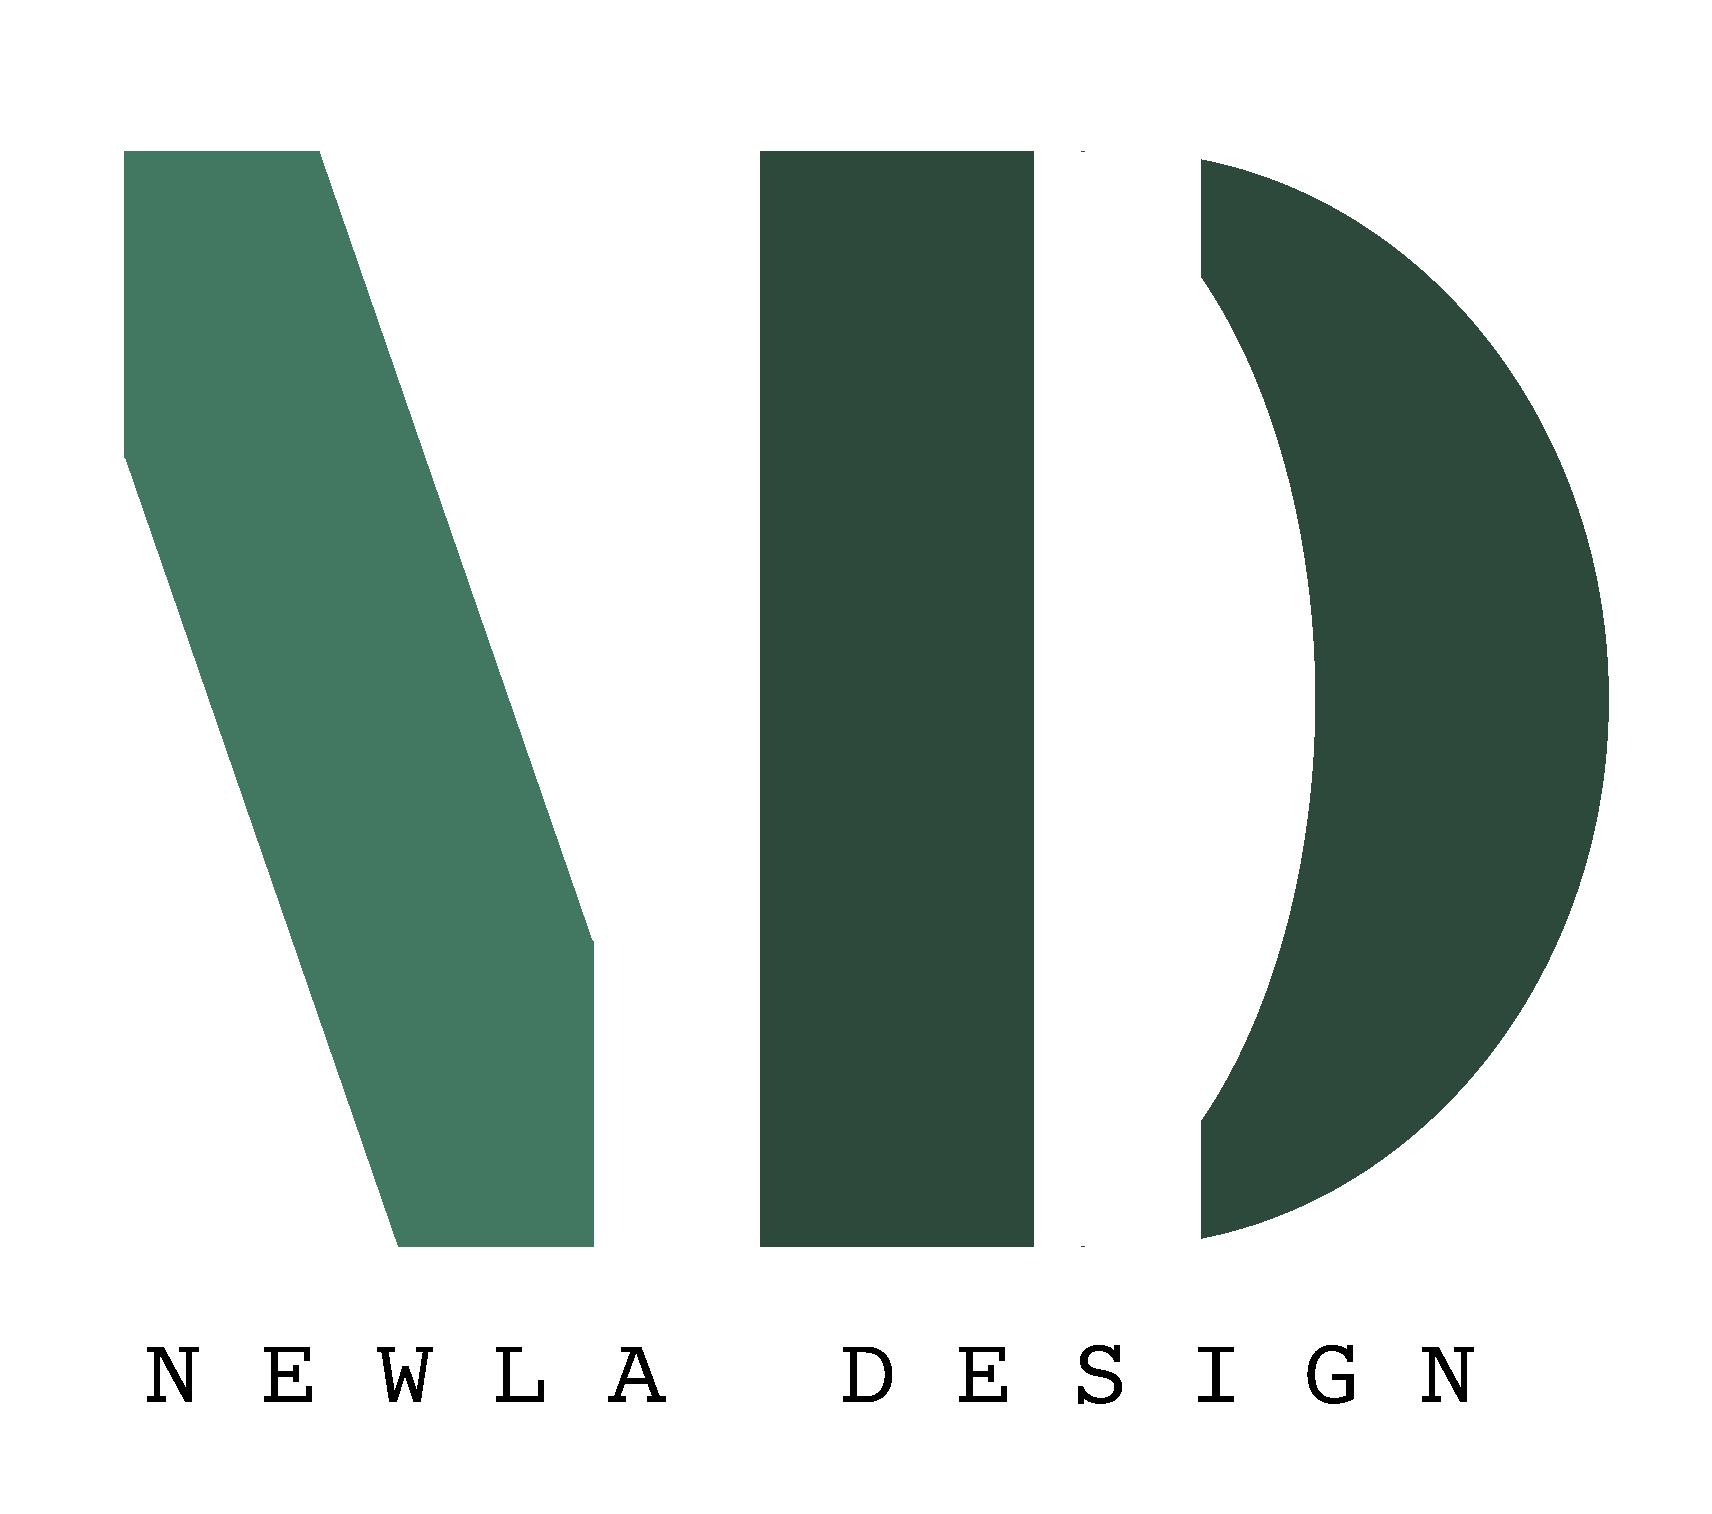 nd-logo-02.png